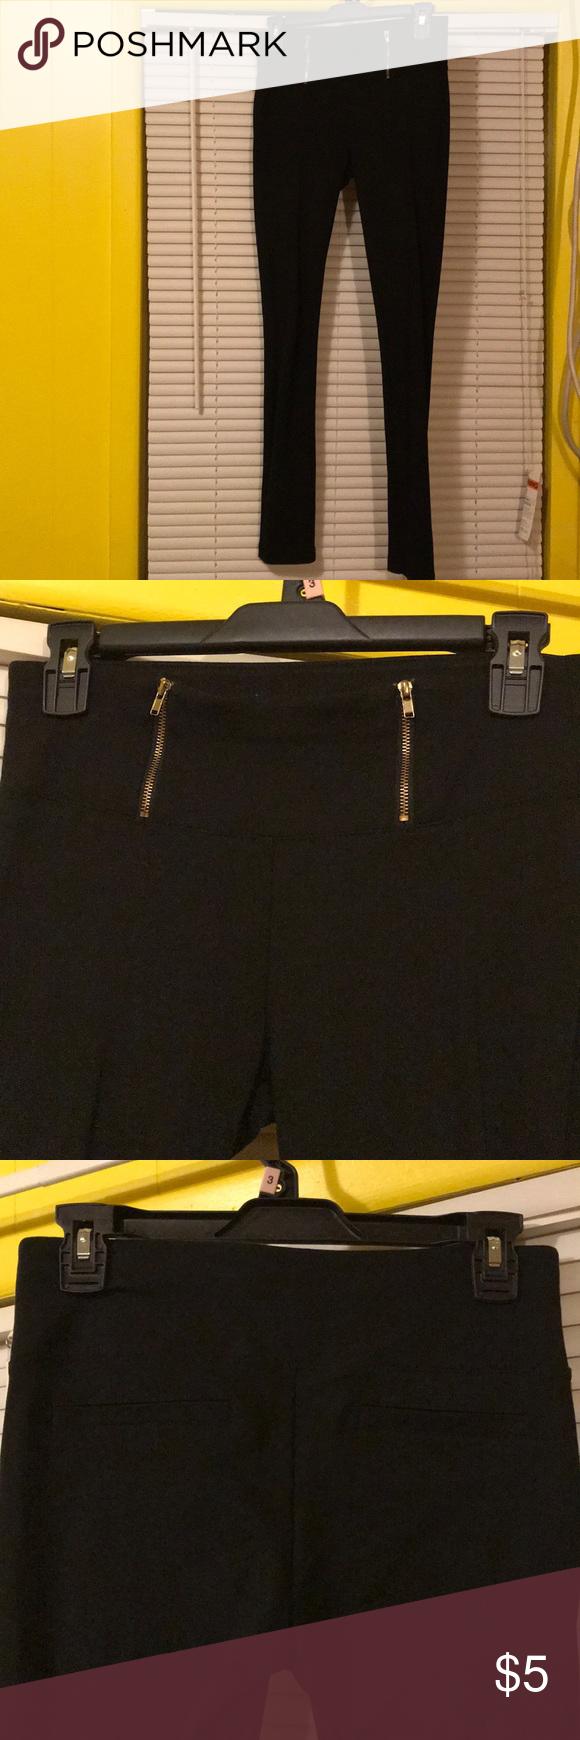 Black leggings/pants Black pants made of a stretchy material like leggings but a little thicker Labijou Pants Leggings